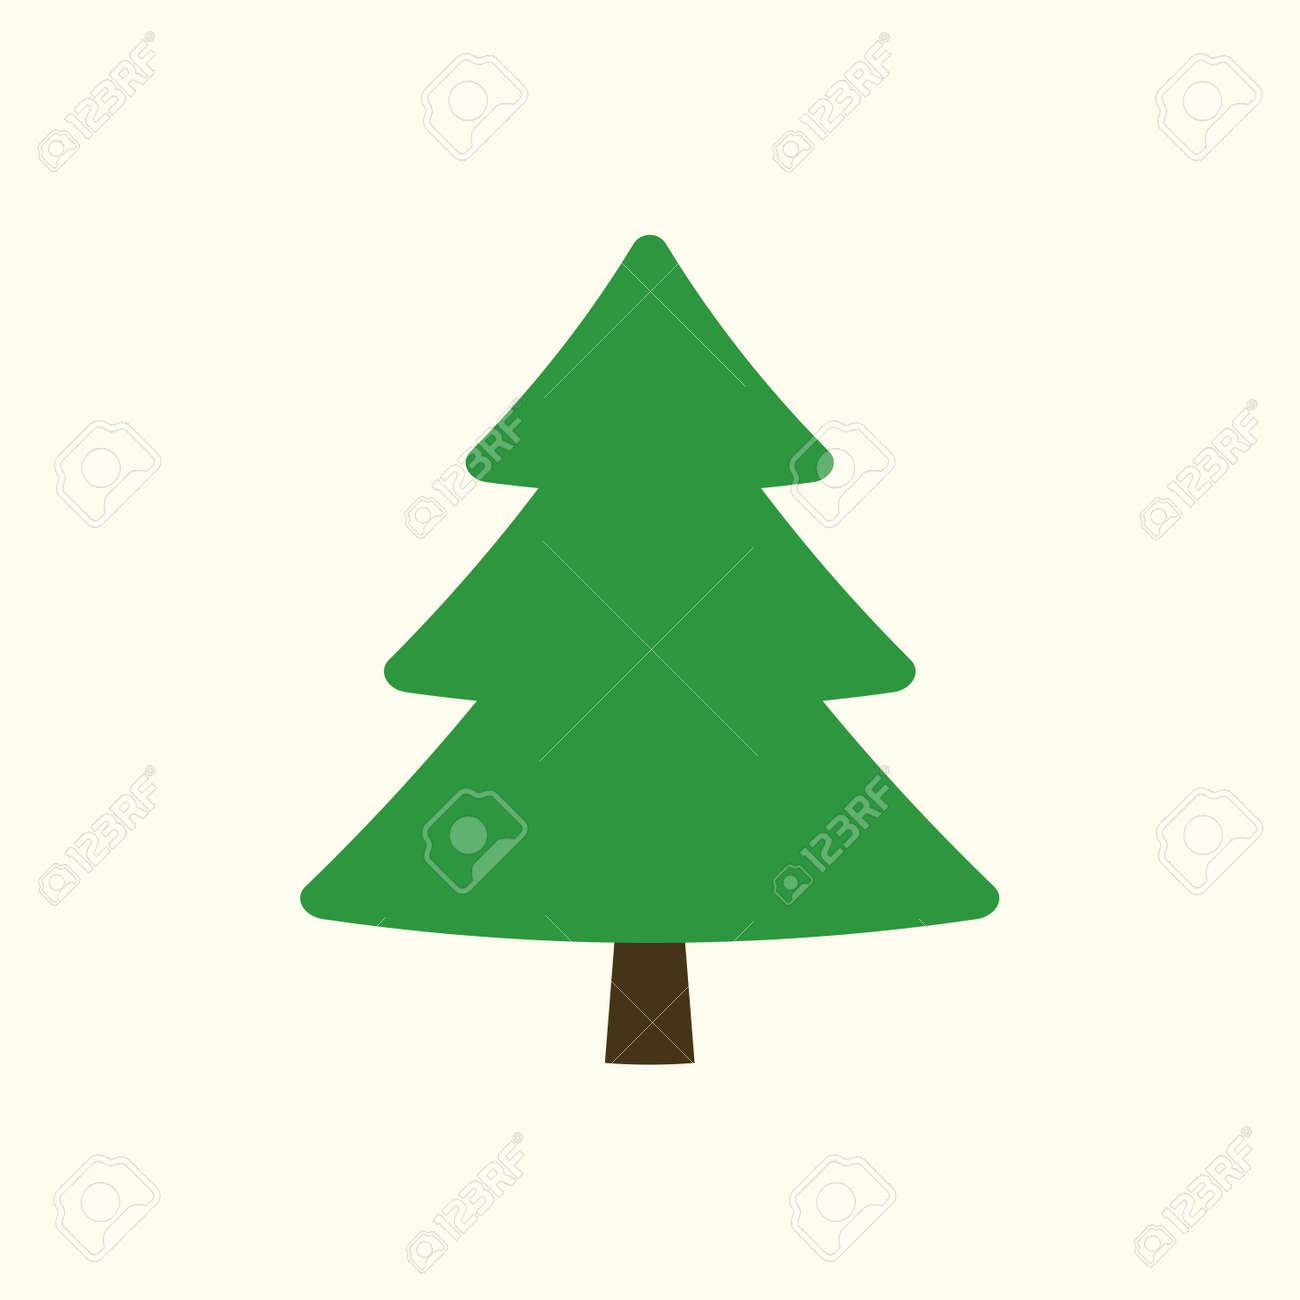 Cartoon Christmas Tree.Christmas Tree Sign Simple Cartoon Icon Green Template Silhouette